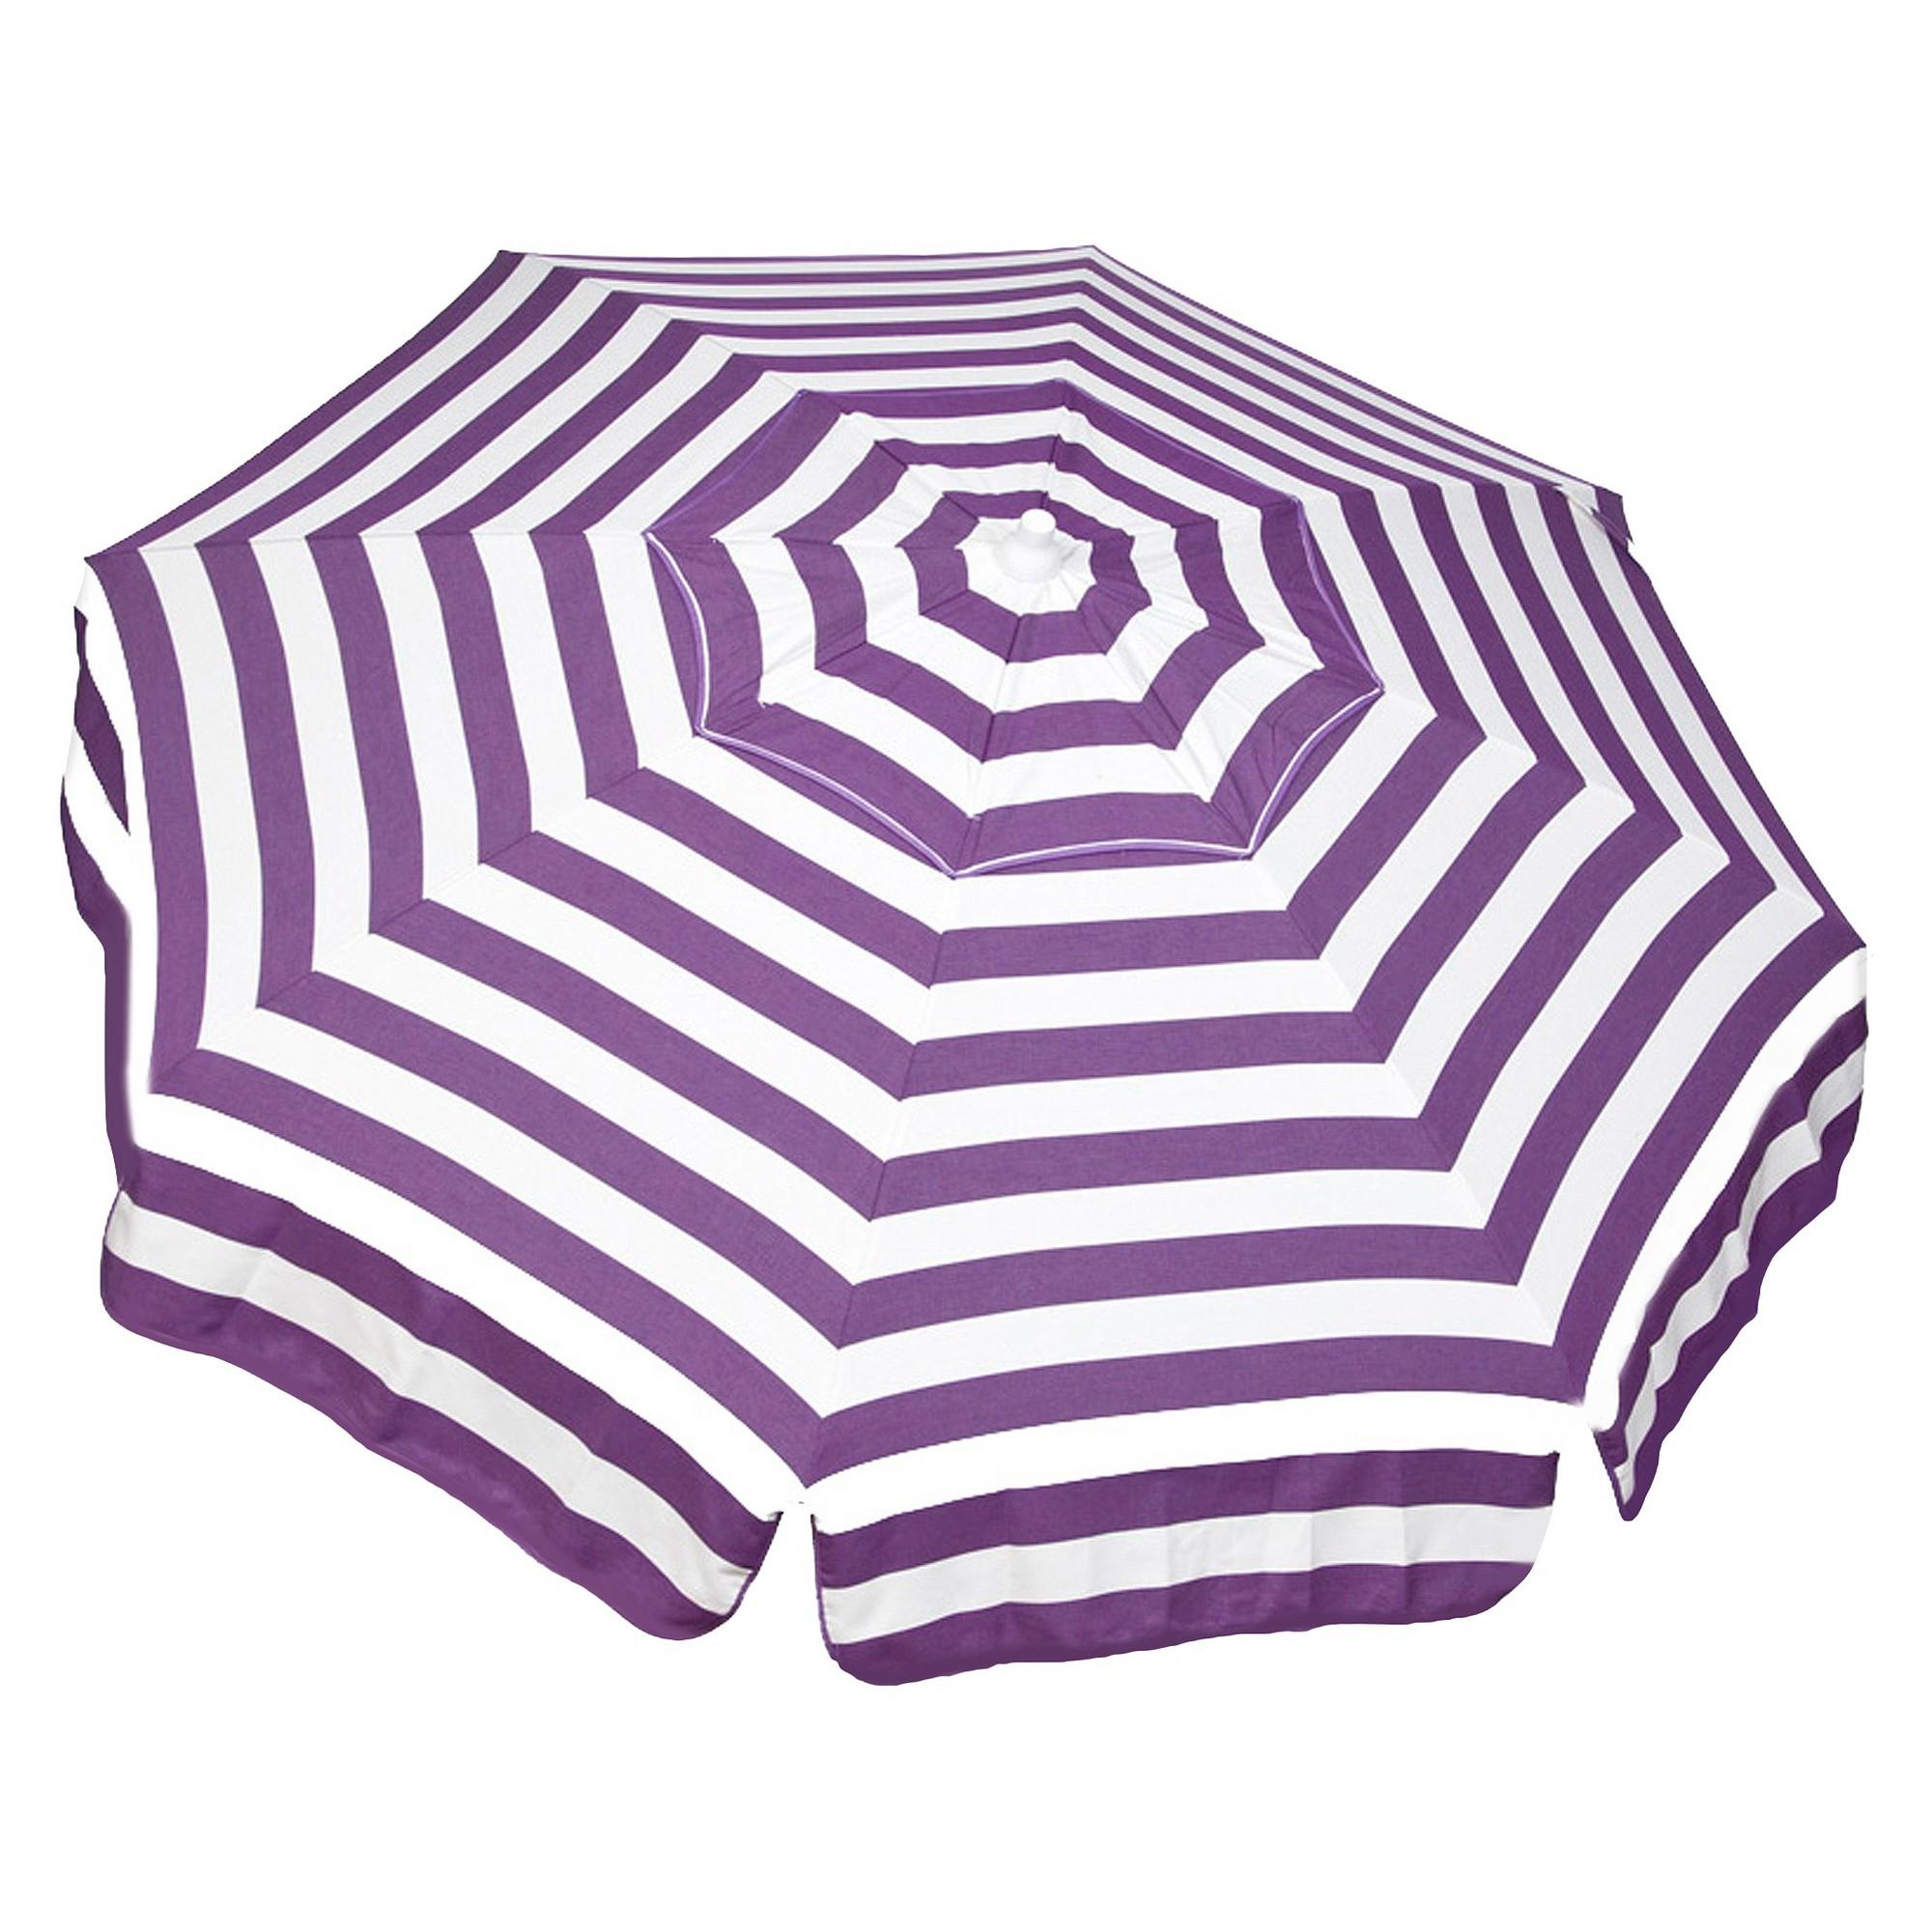 Parasol 6' Italian Aluminum Collar Tilt Beach Umbrella – Purple Within Fashionable Italian Drape Umbrellas (View 14 of 20)